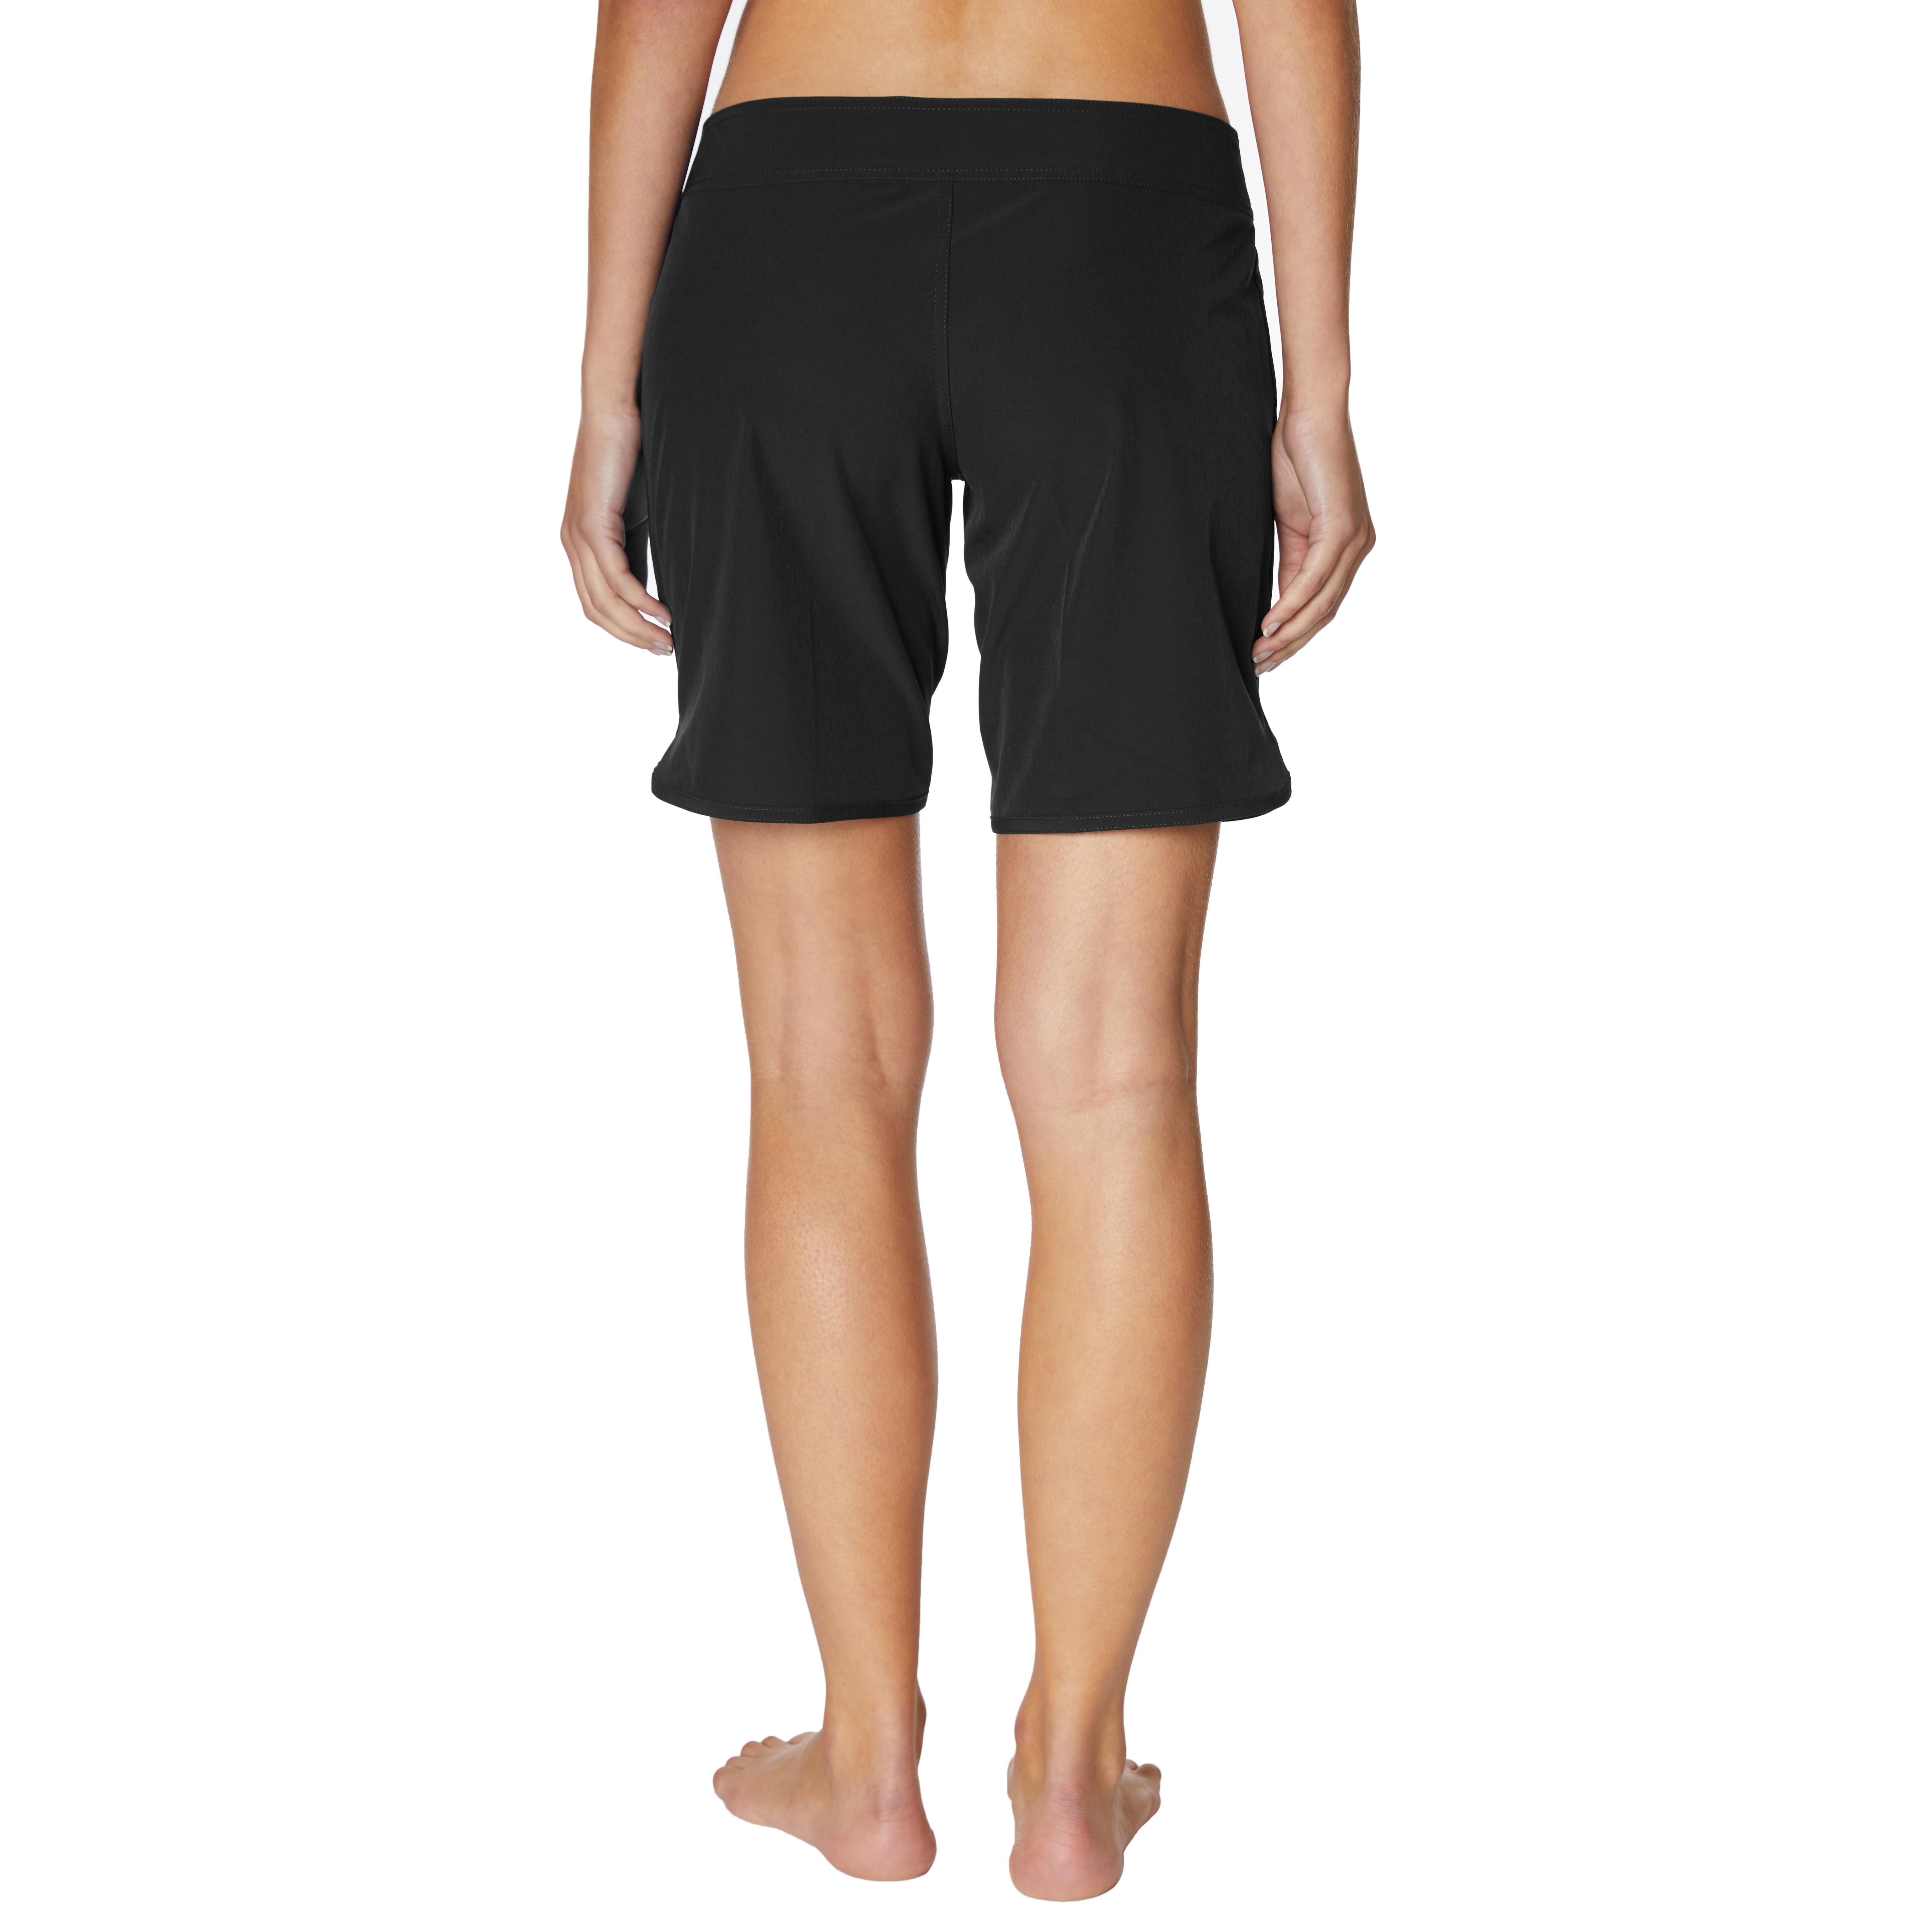 Nautica® Swimsuit Board Shorts - Black - Back